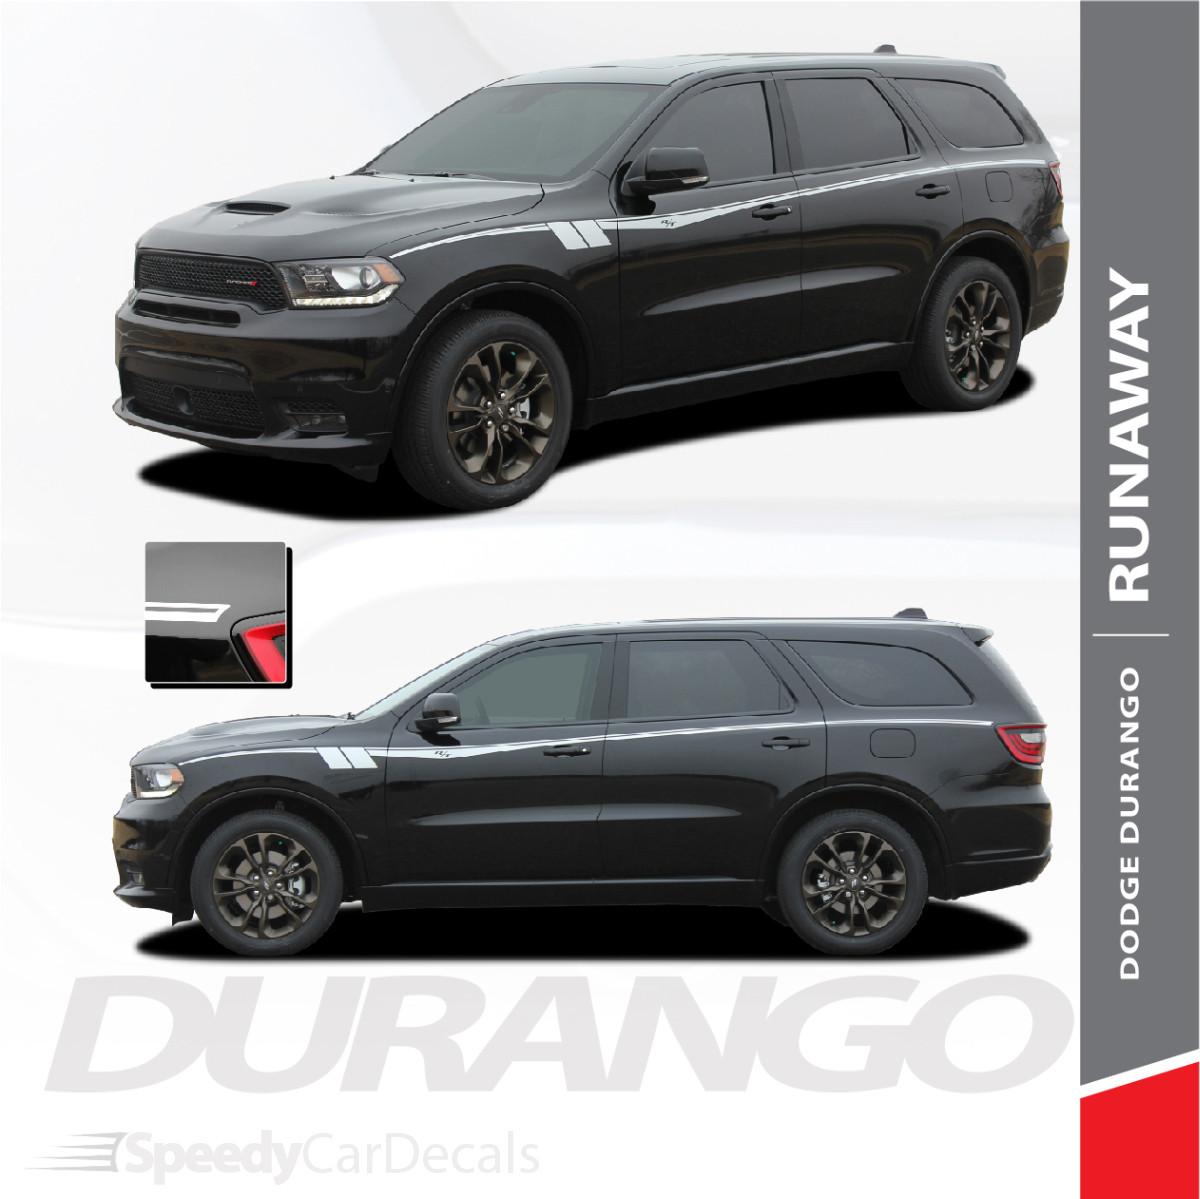 2020 Dodge Durango Side Stripes RUNAWAY 2011-2021